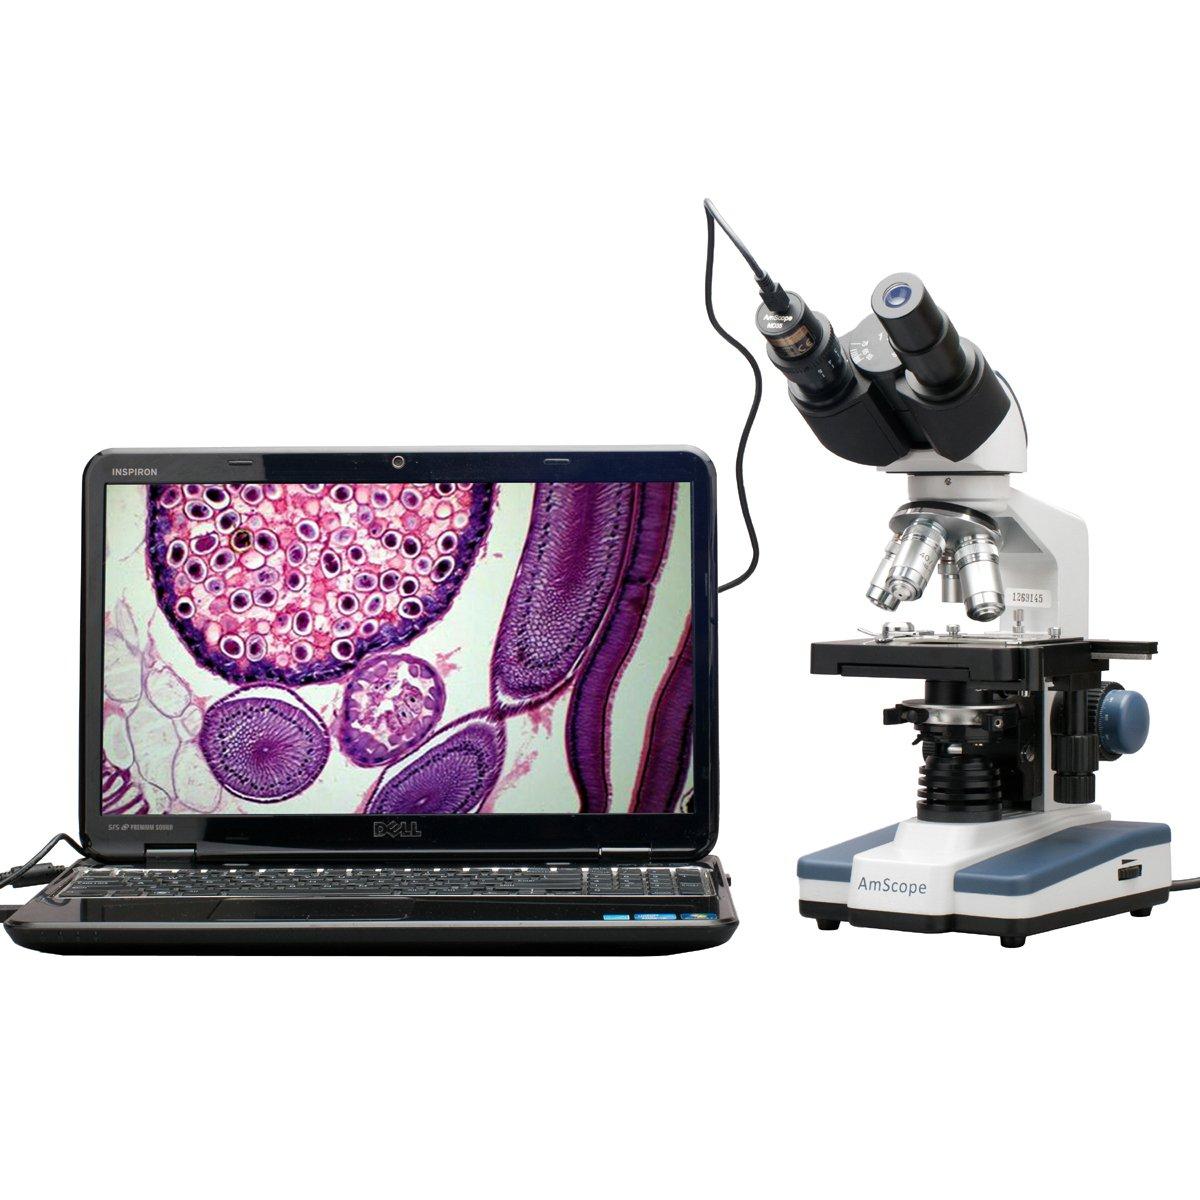 40X-2500X LED Digital Binocular Compound Microscope w 3D Stage + 5MP USB Camera by AmScope